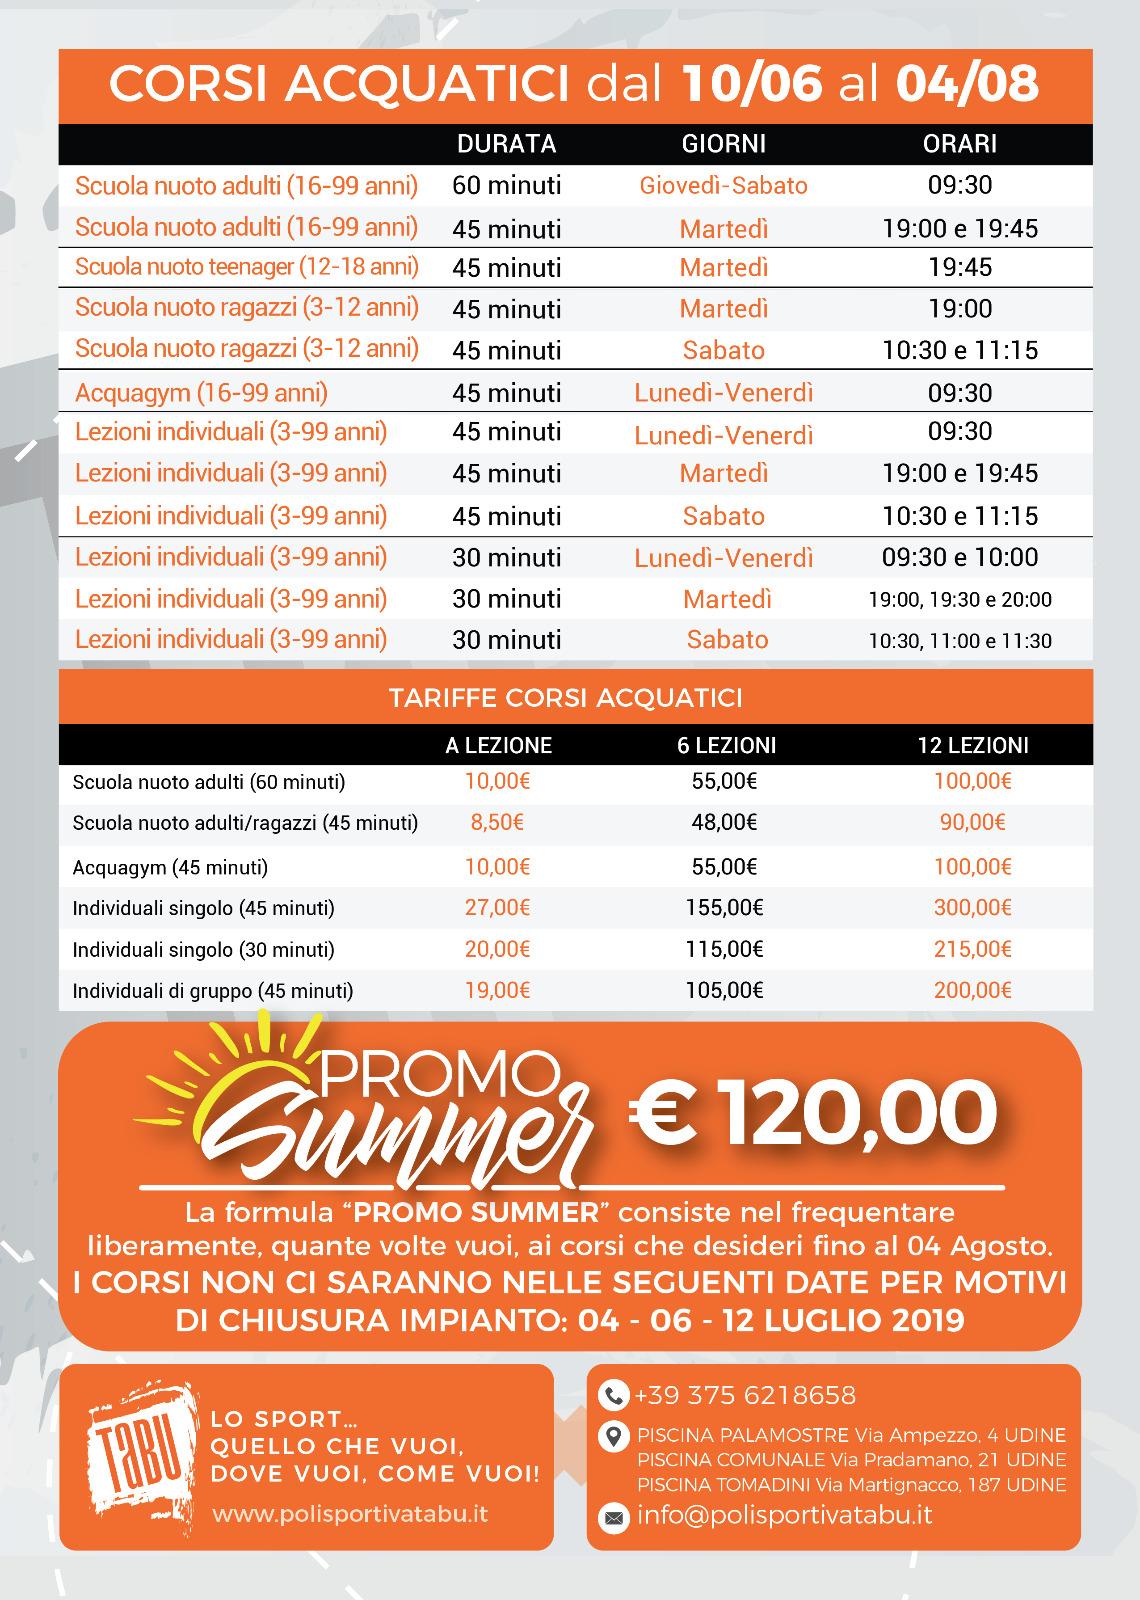 Corsi acquatici estate 2019 a Udine Palamostre